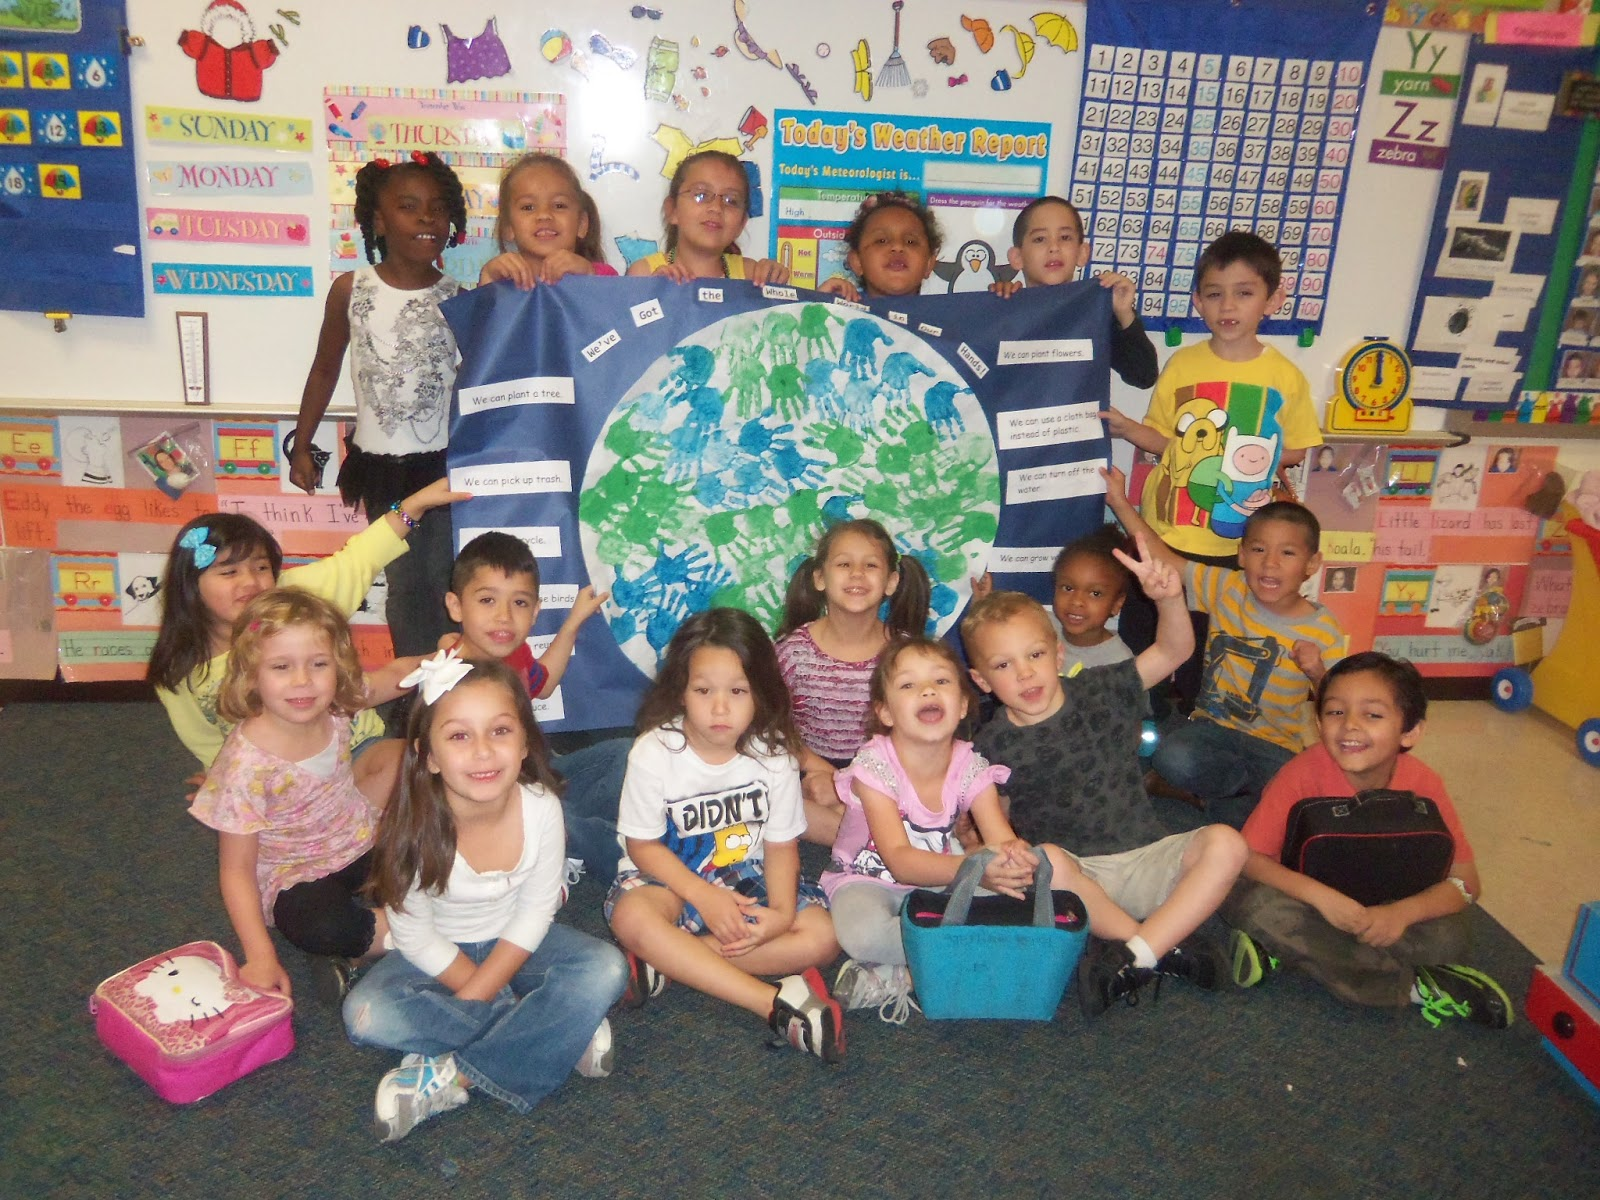 Kinder Garden: Mrs. Wood's Kindergarten Class: Earth Day